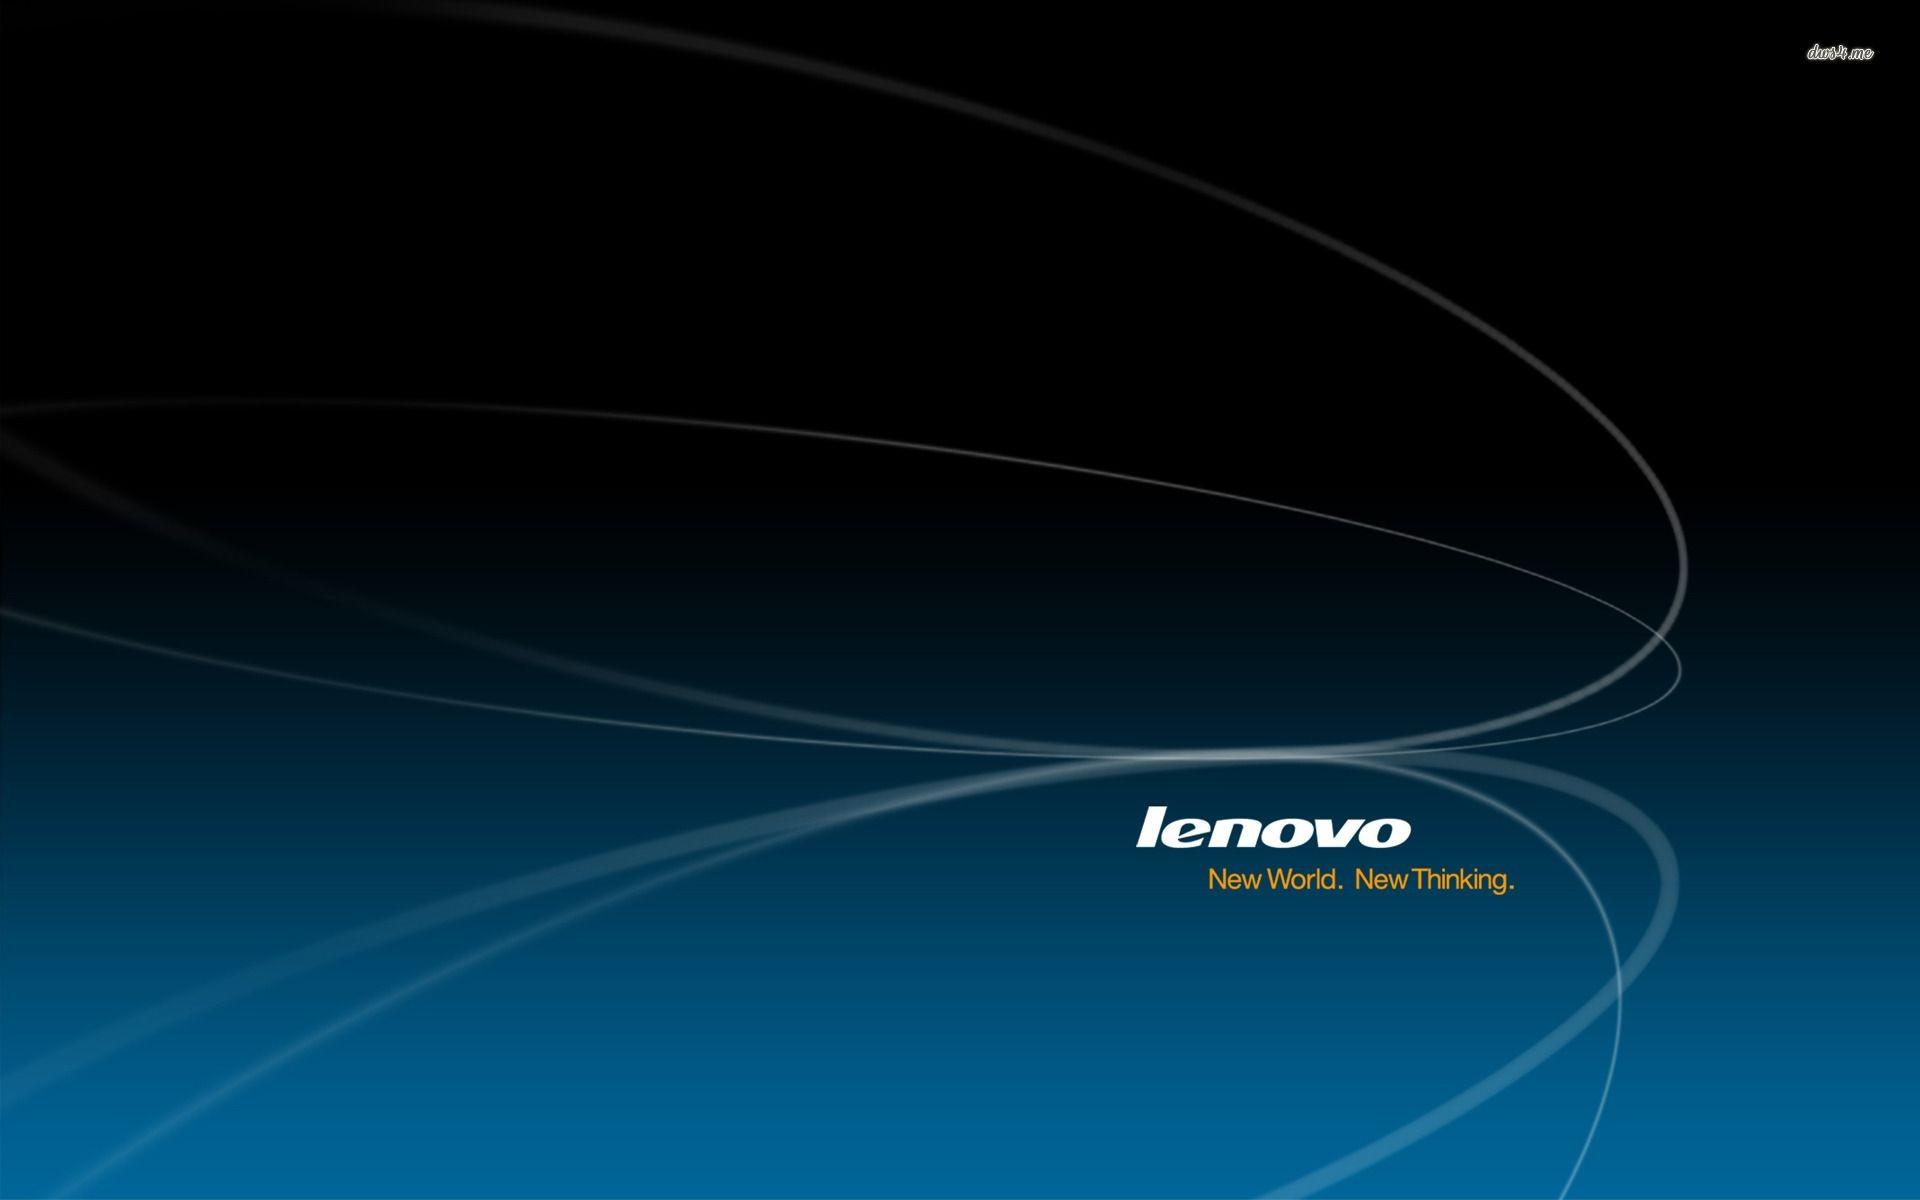 lenovo wallpapers hd windows wallpapers - HD1920×1200